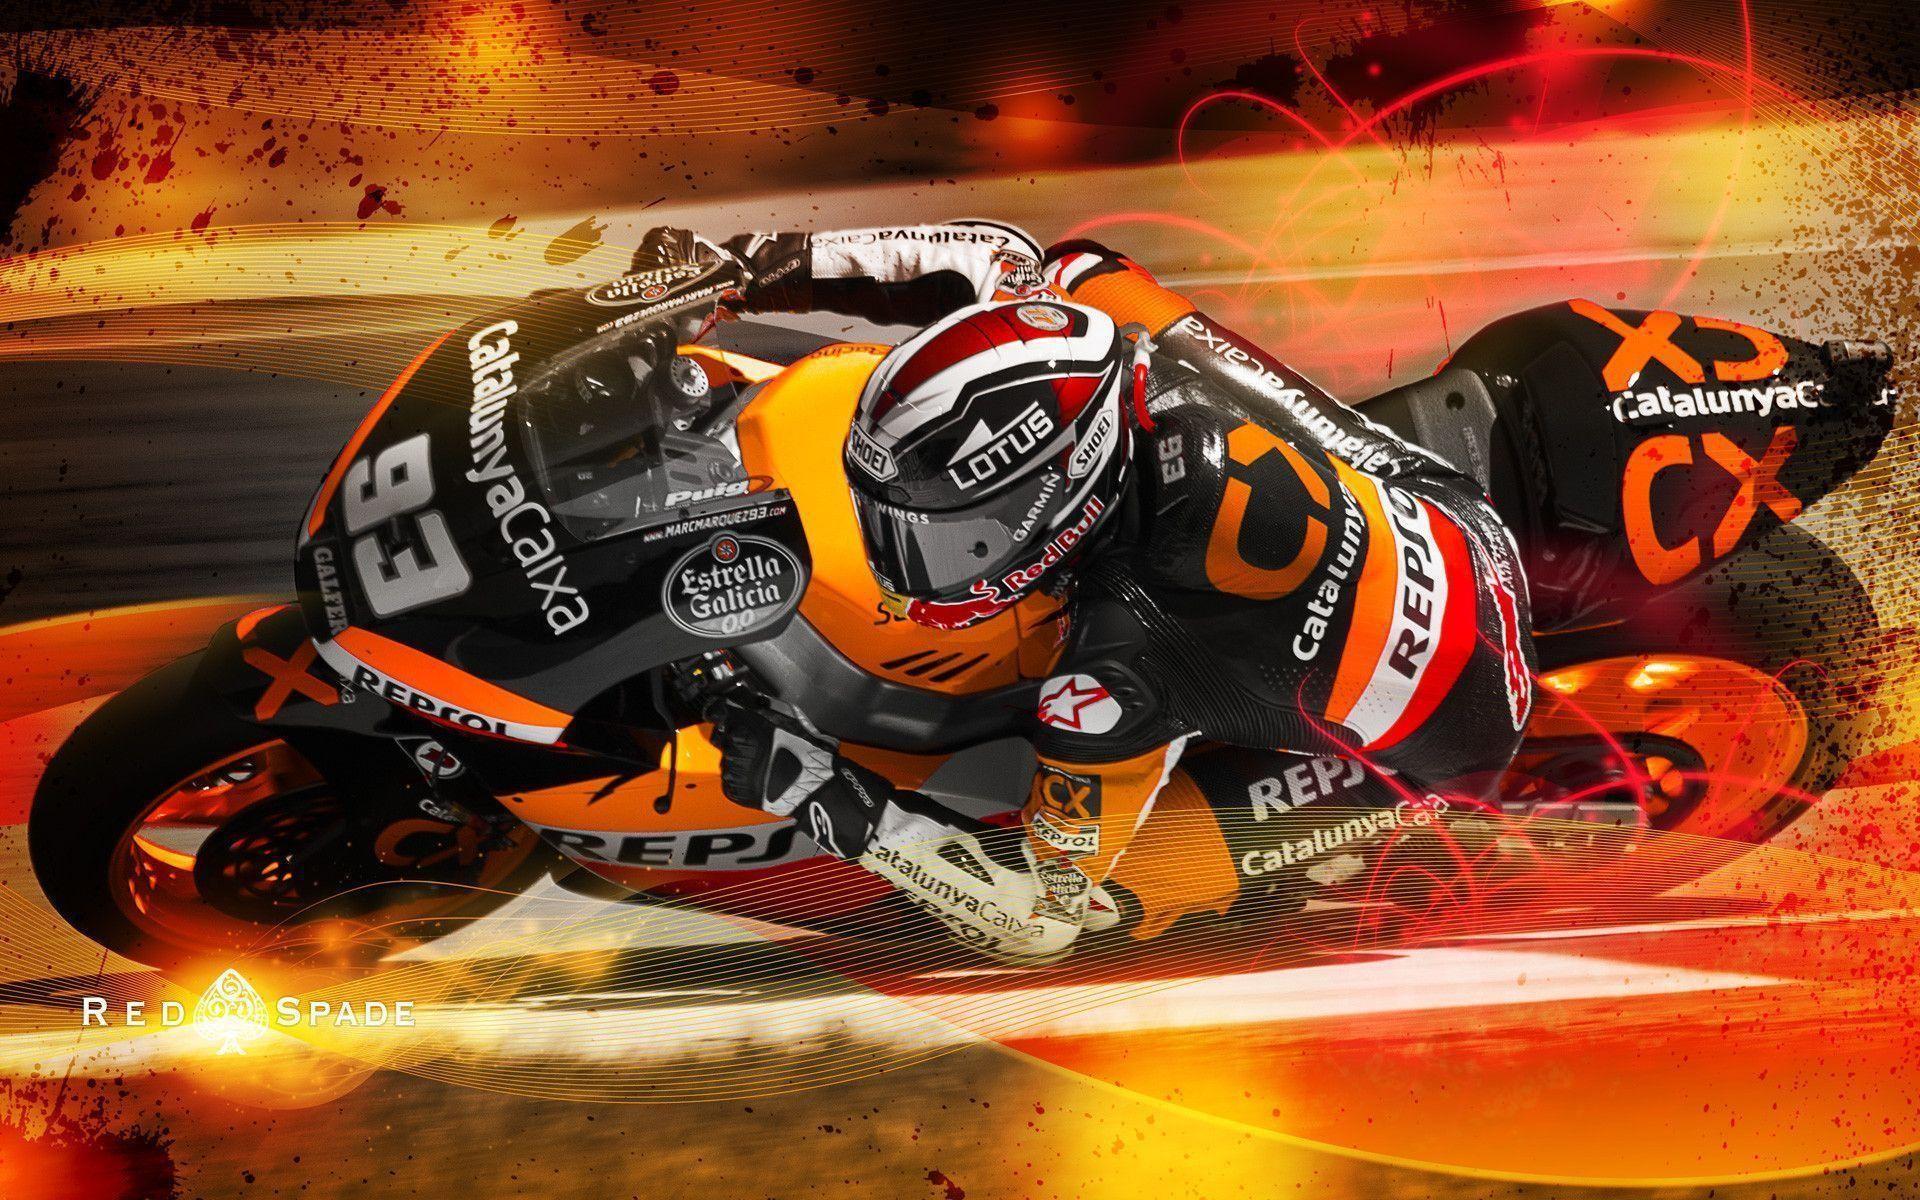 Marc Marquez Motogp Wallpaper Downloads HD Wallpaper Pictures .